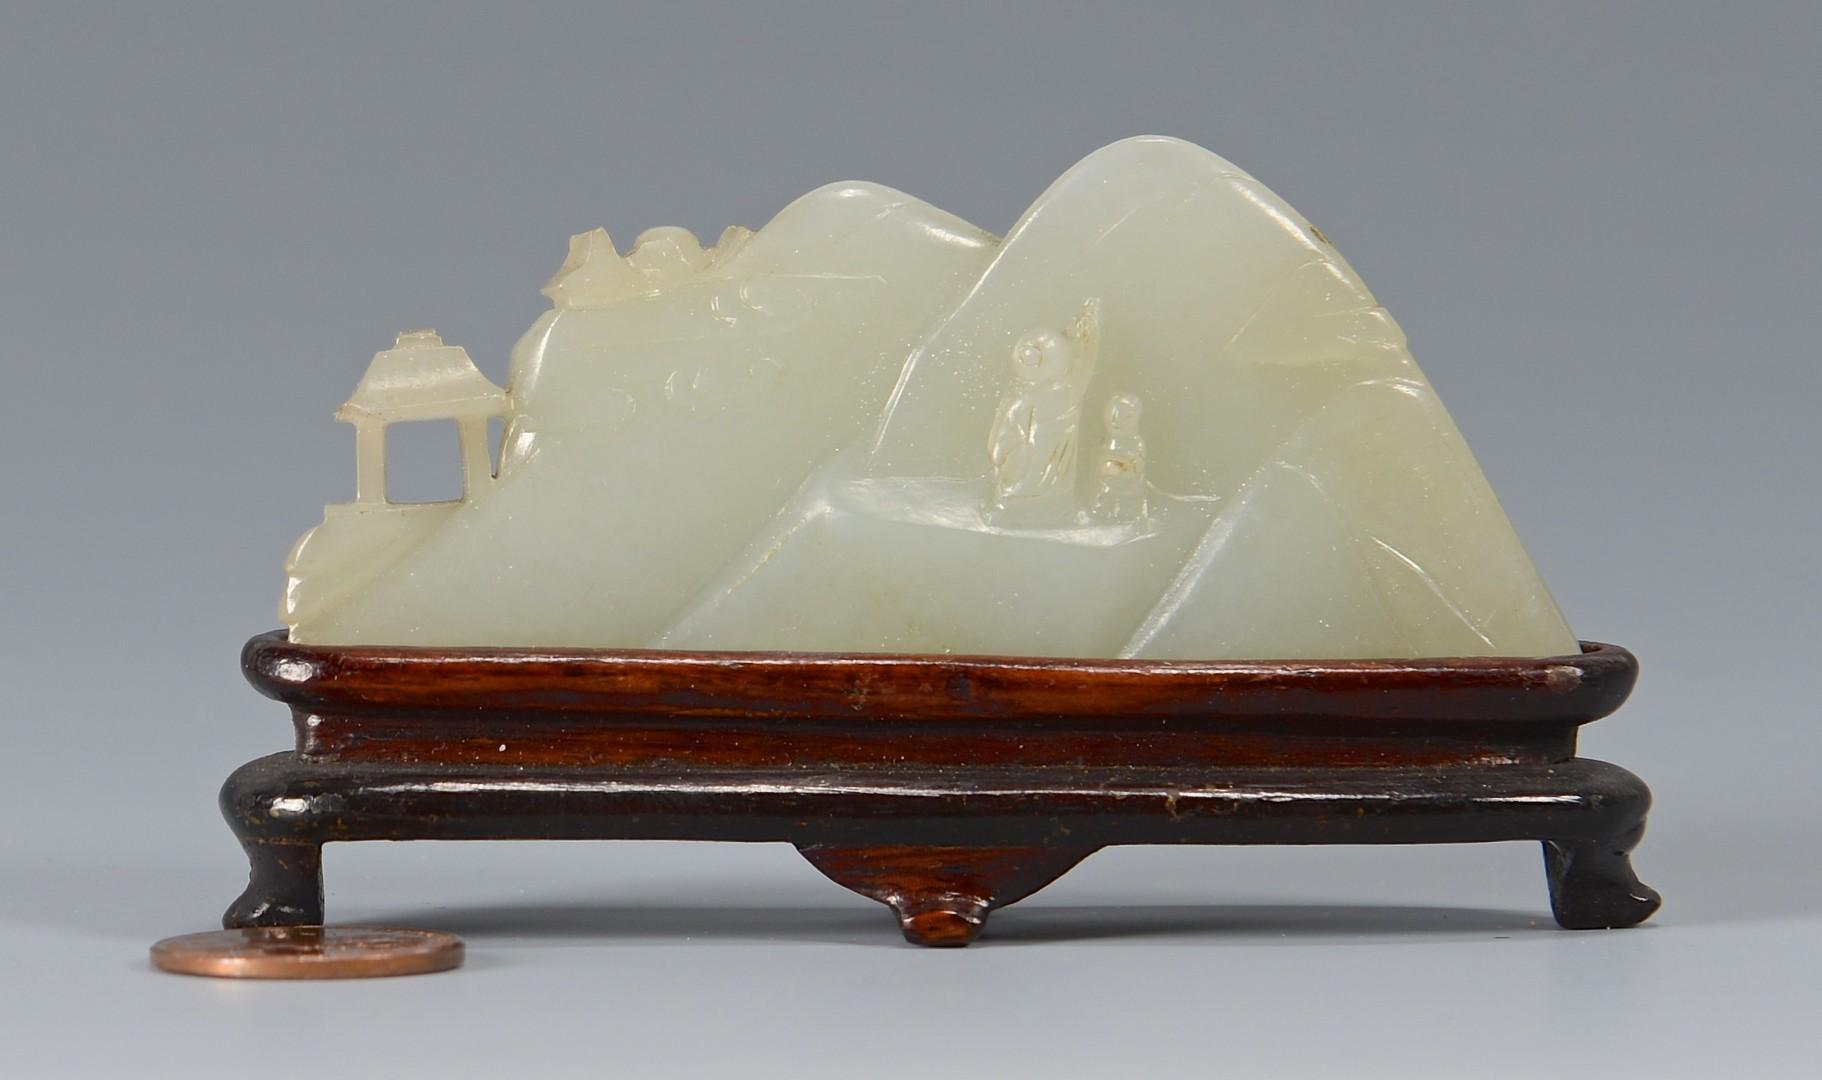 Lot 3594148: White jade mountain carving